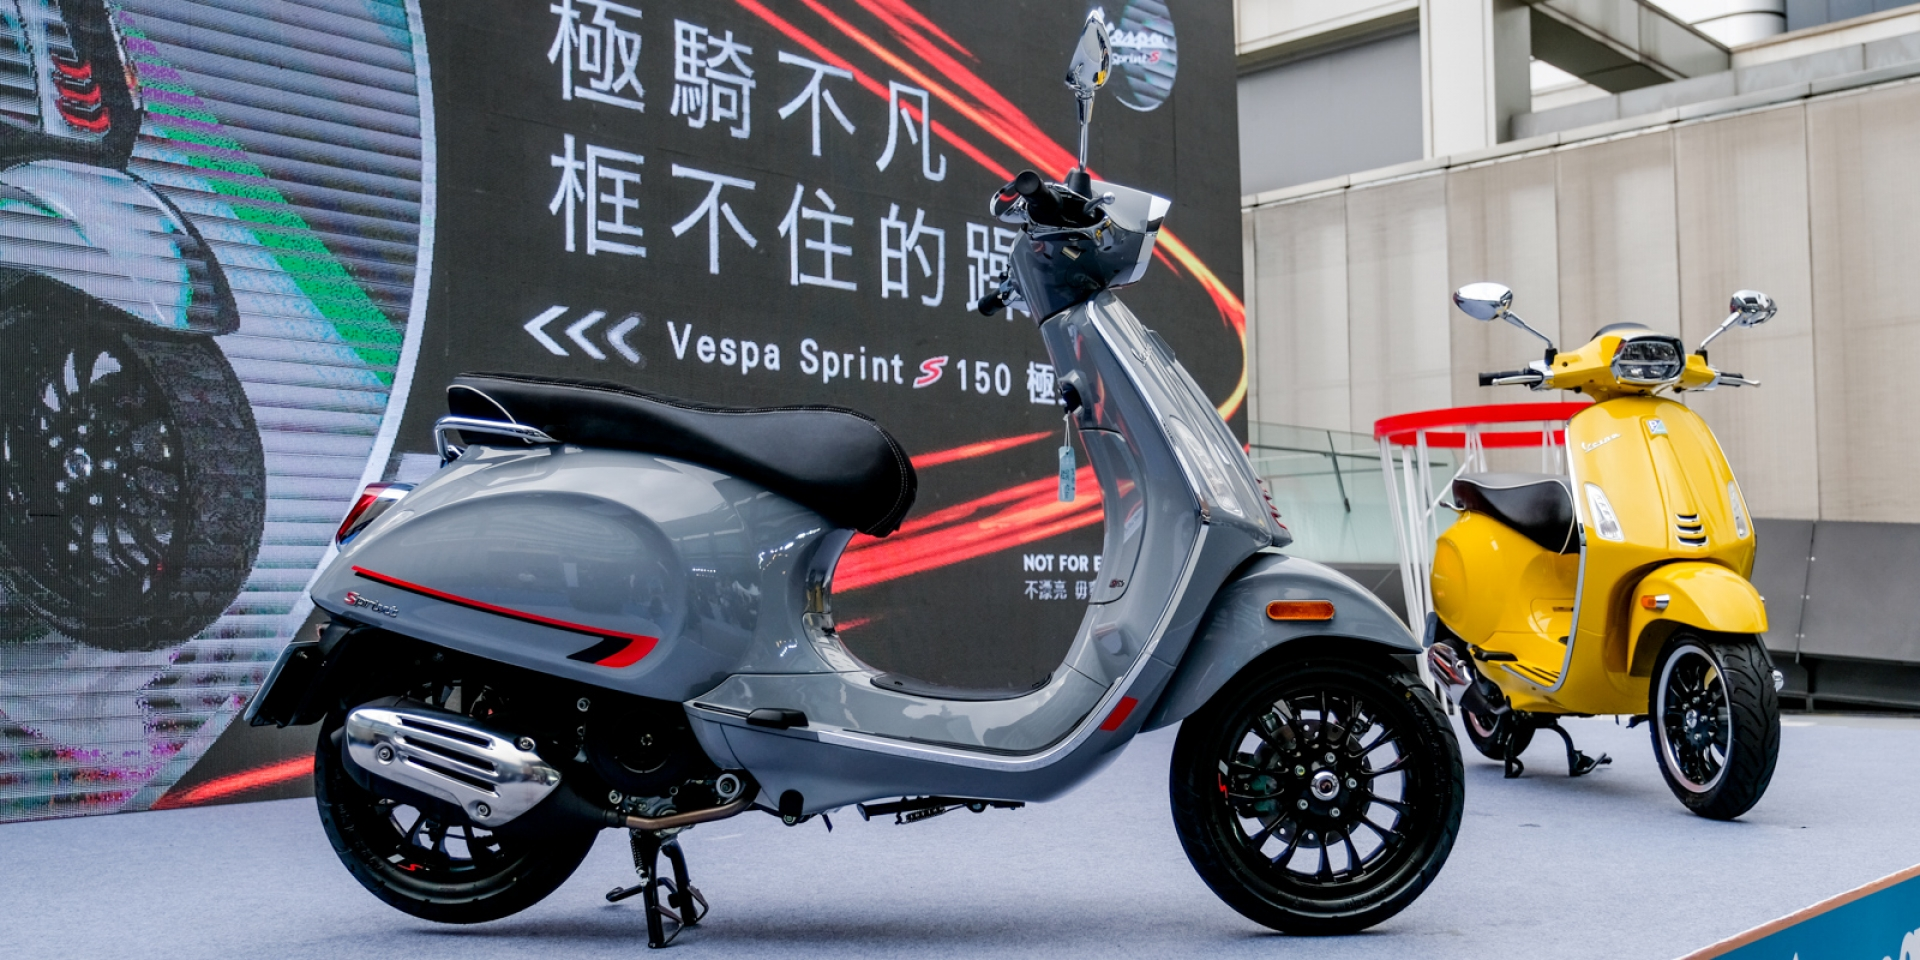 「衝刺」新時尚,VESPA Sprint S 150 i-get ABS台灣上市